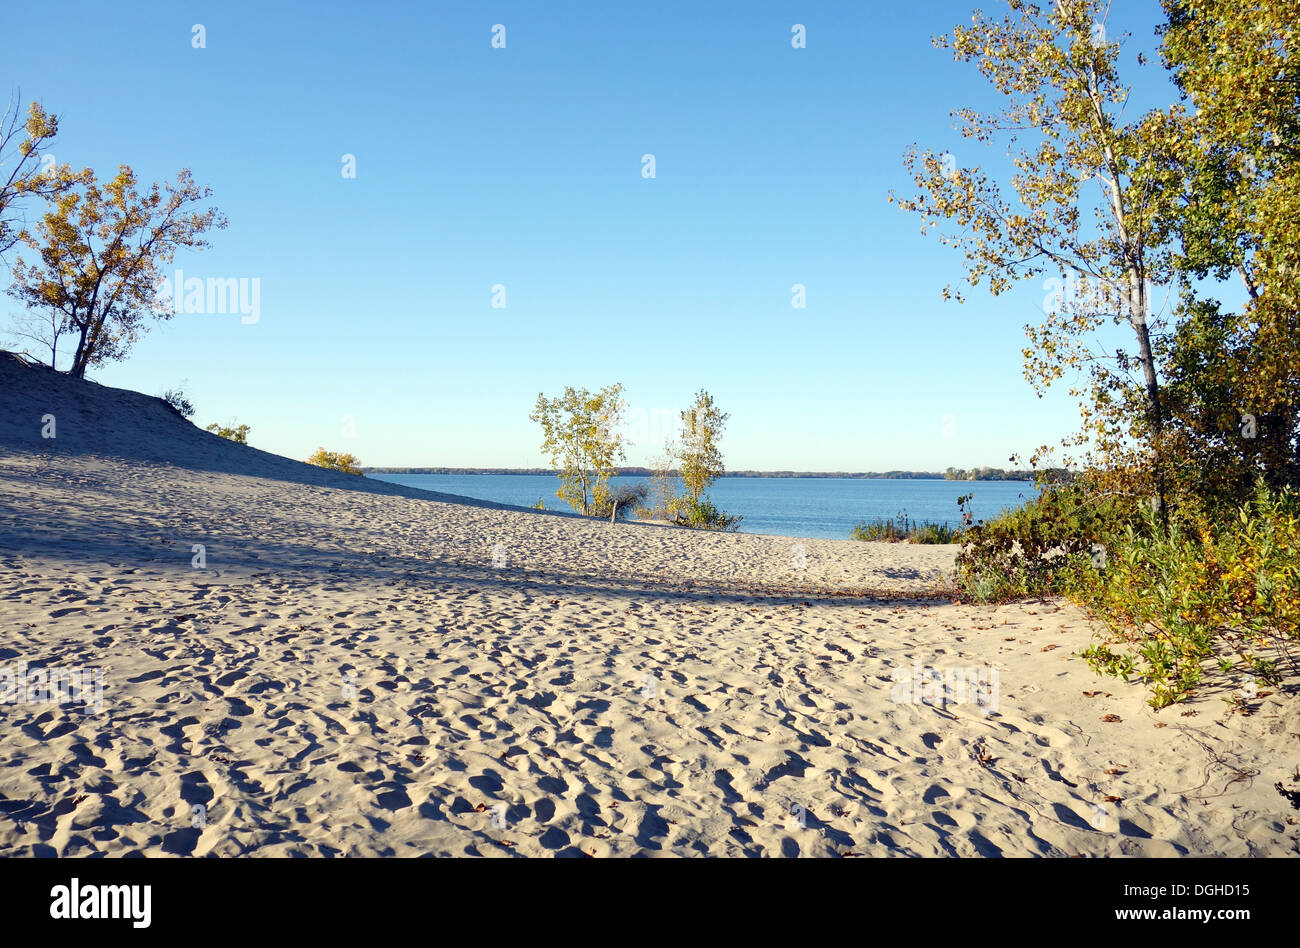 Sandbanks Provincial Park on the Lake Ontario, Canada - Stock Image